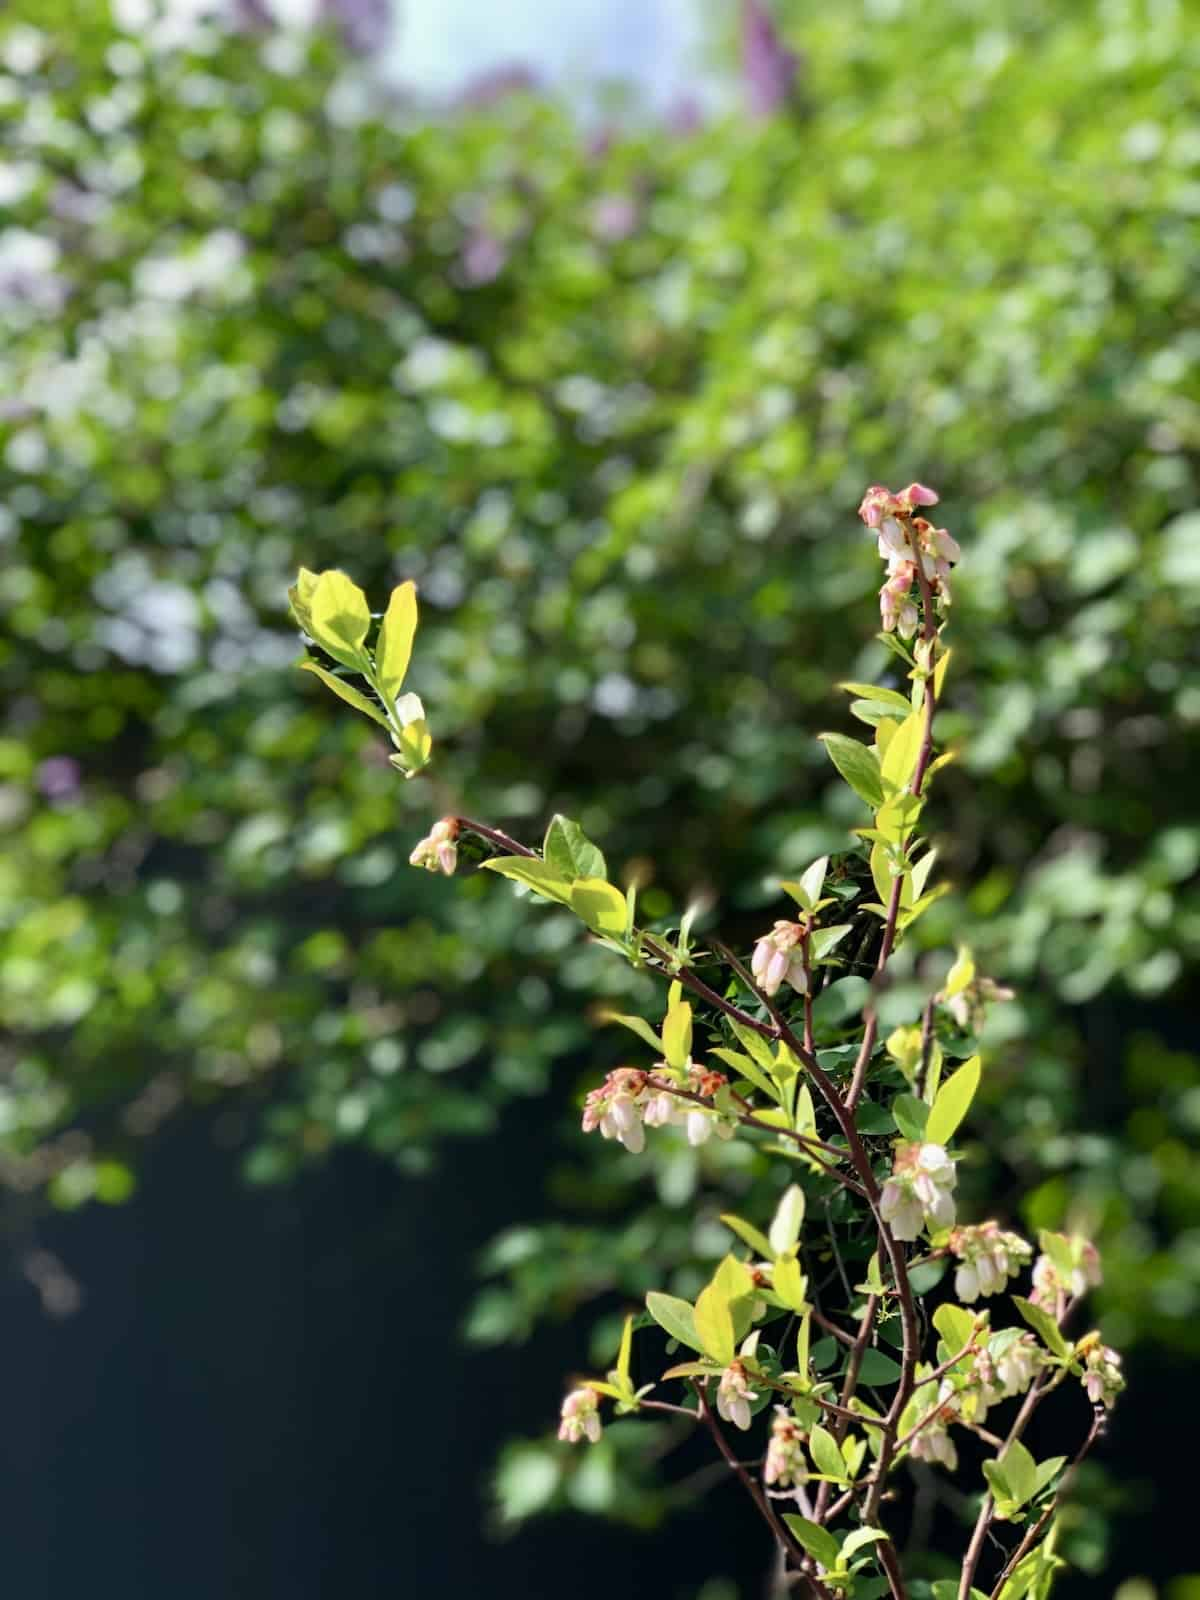 Companion Plants for Blueberries